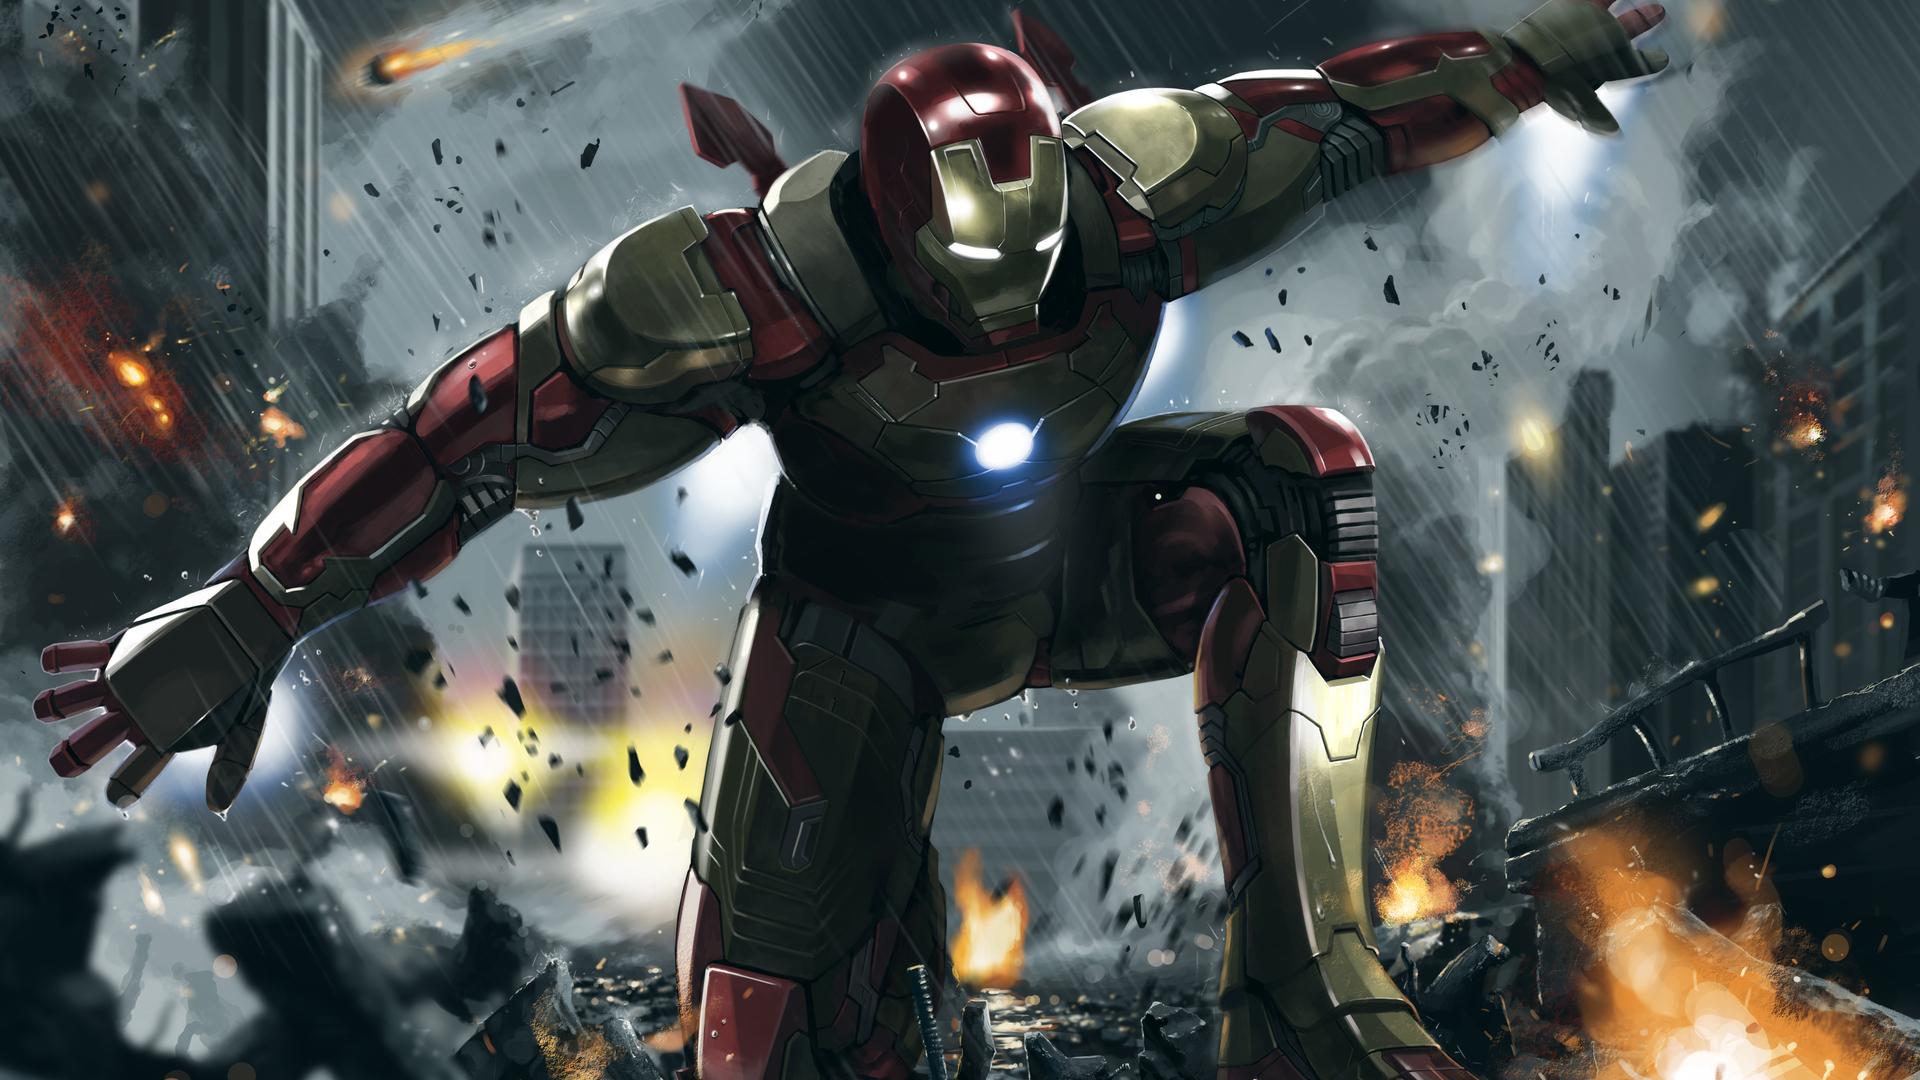 1920x1080 Iron Man 3 Art 4k Laptop Full Hd 1080p Hd 4k Wallpapers